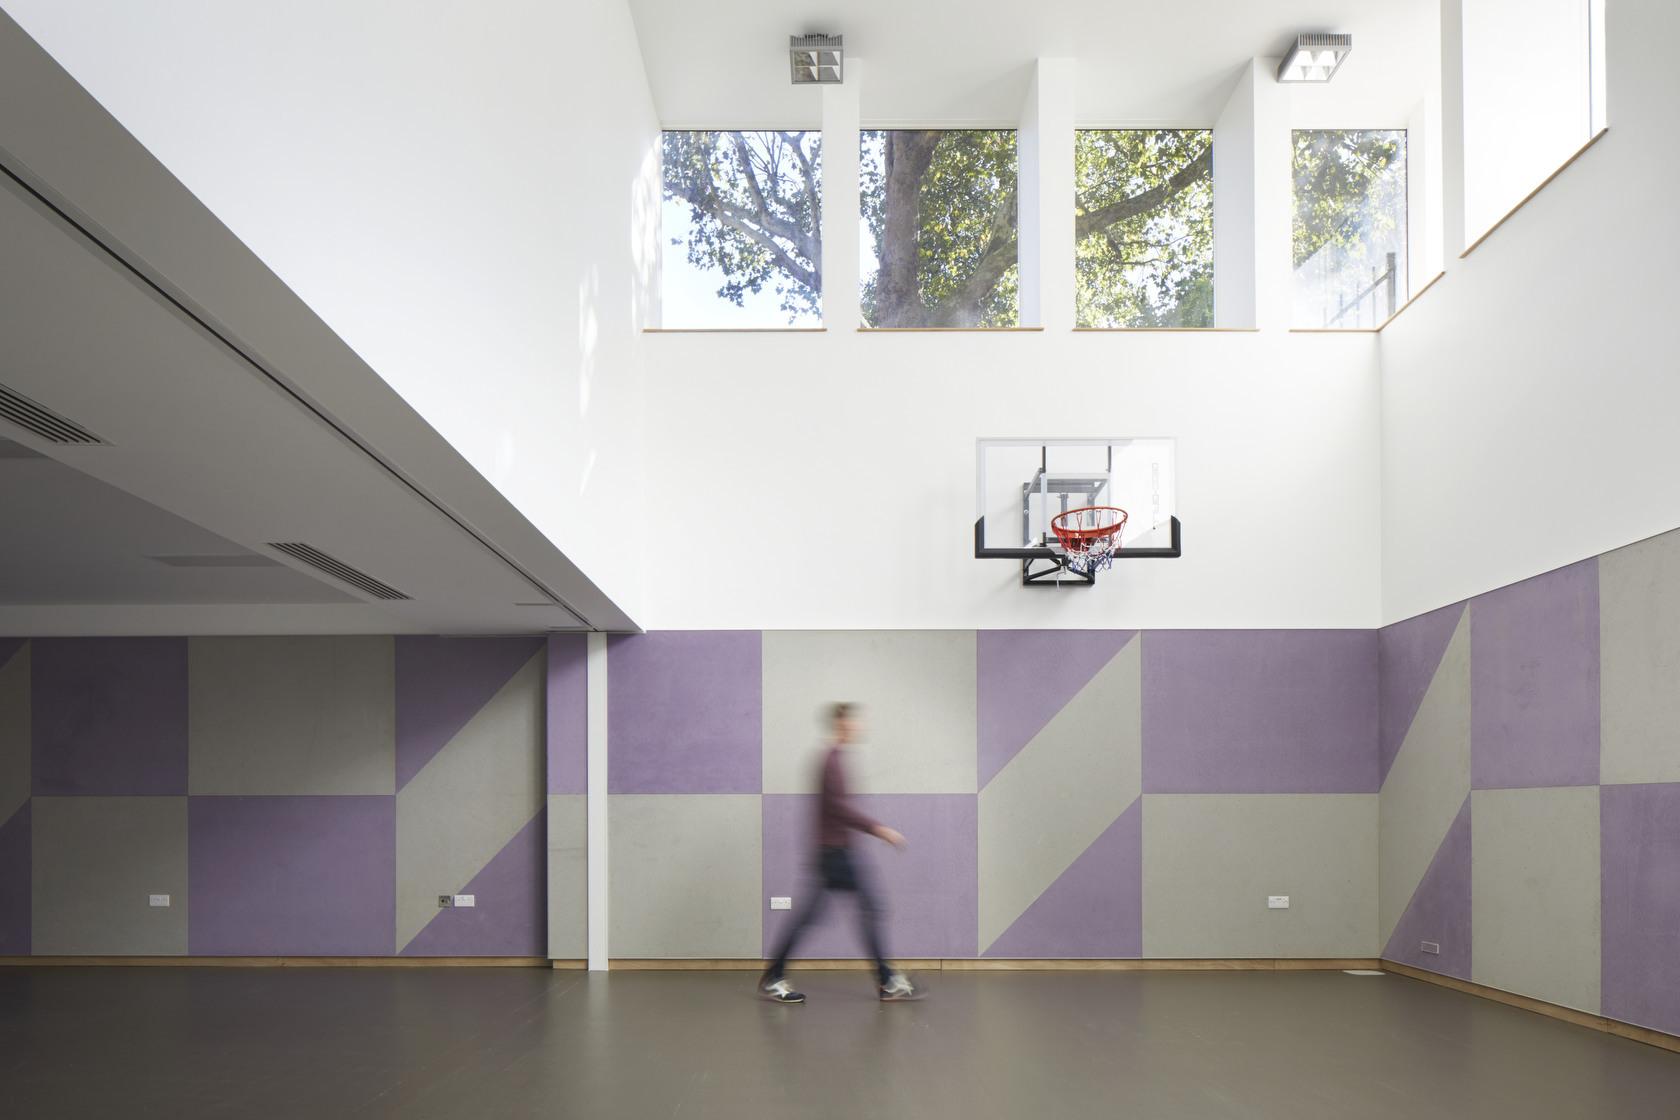 Bethnal Green Mission Church / Gatti Routh Rhodes Architects